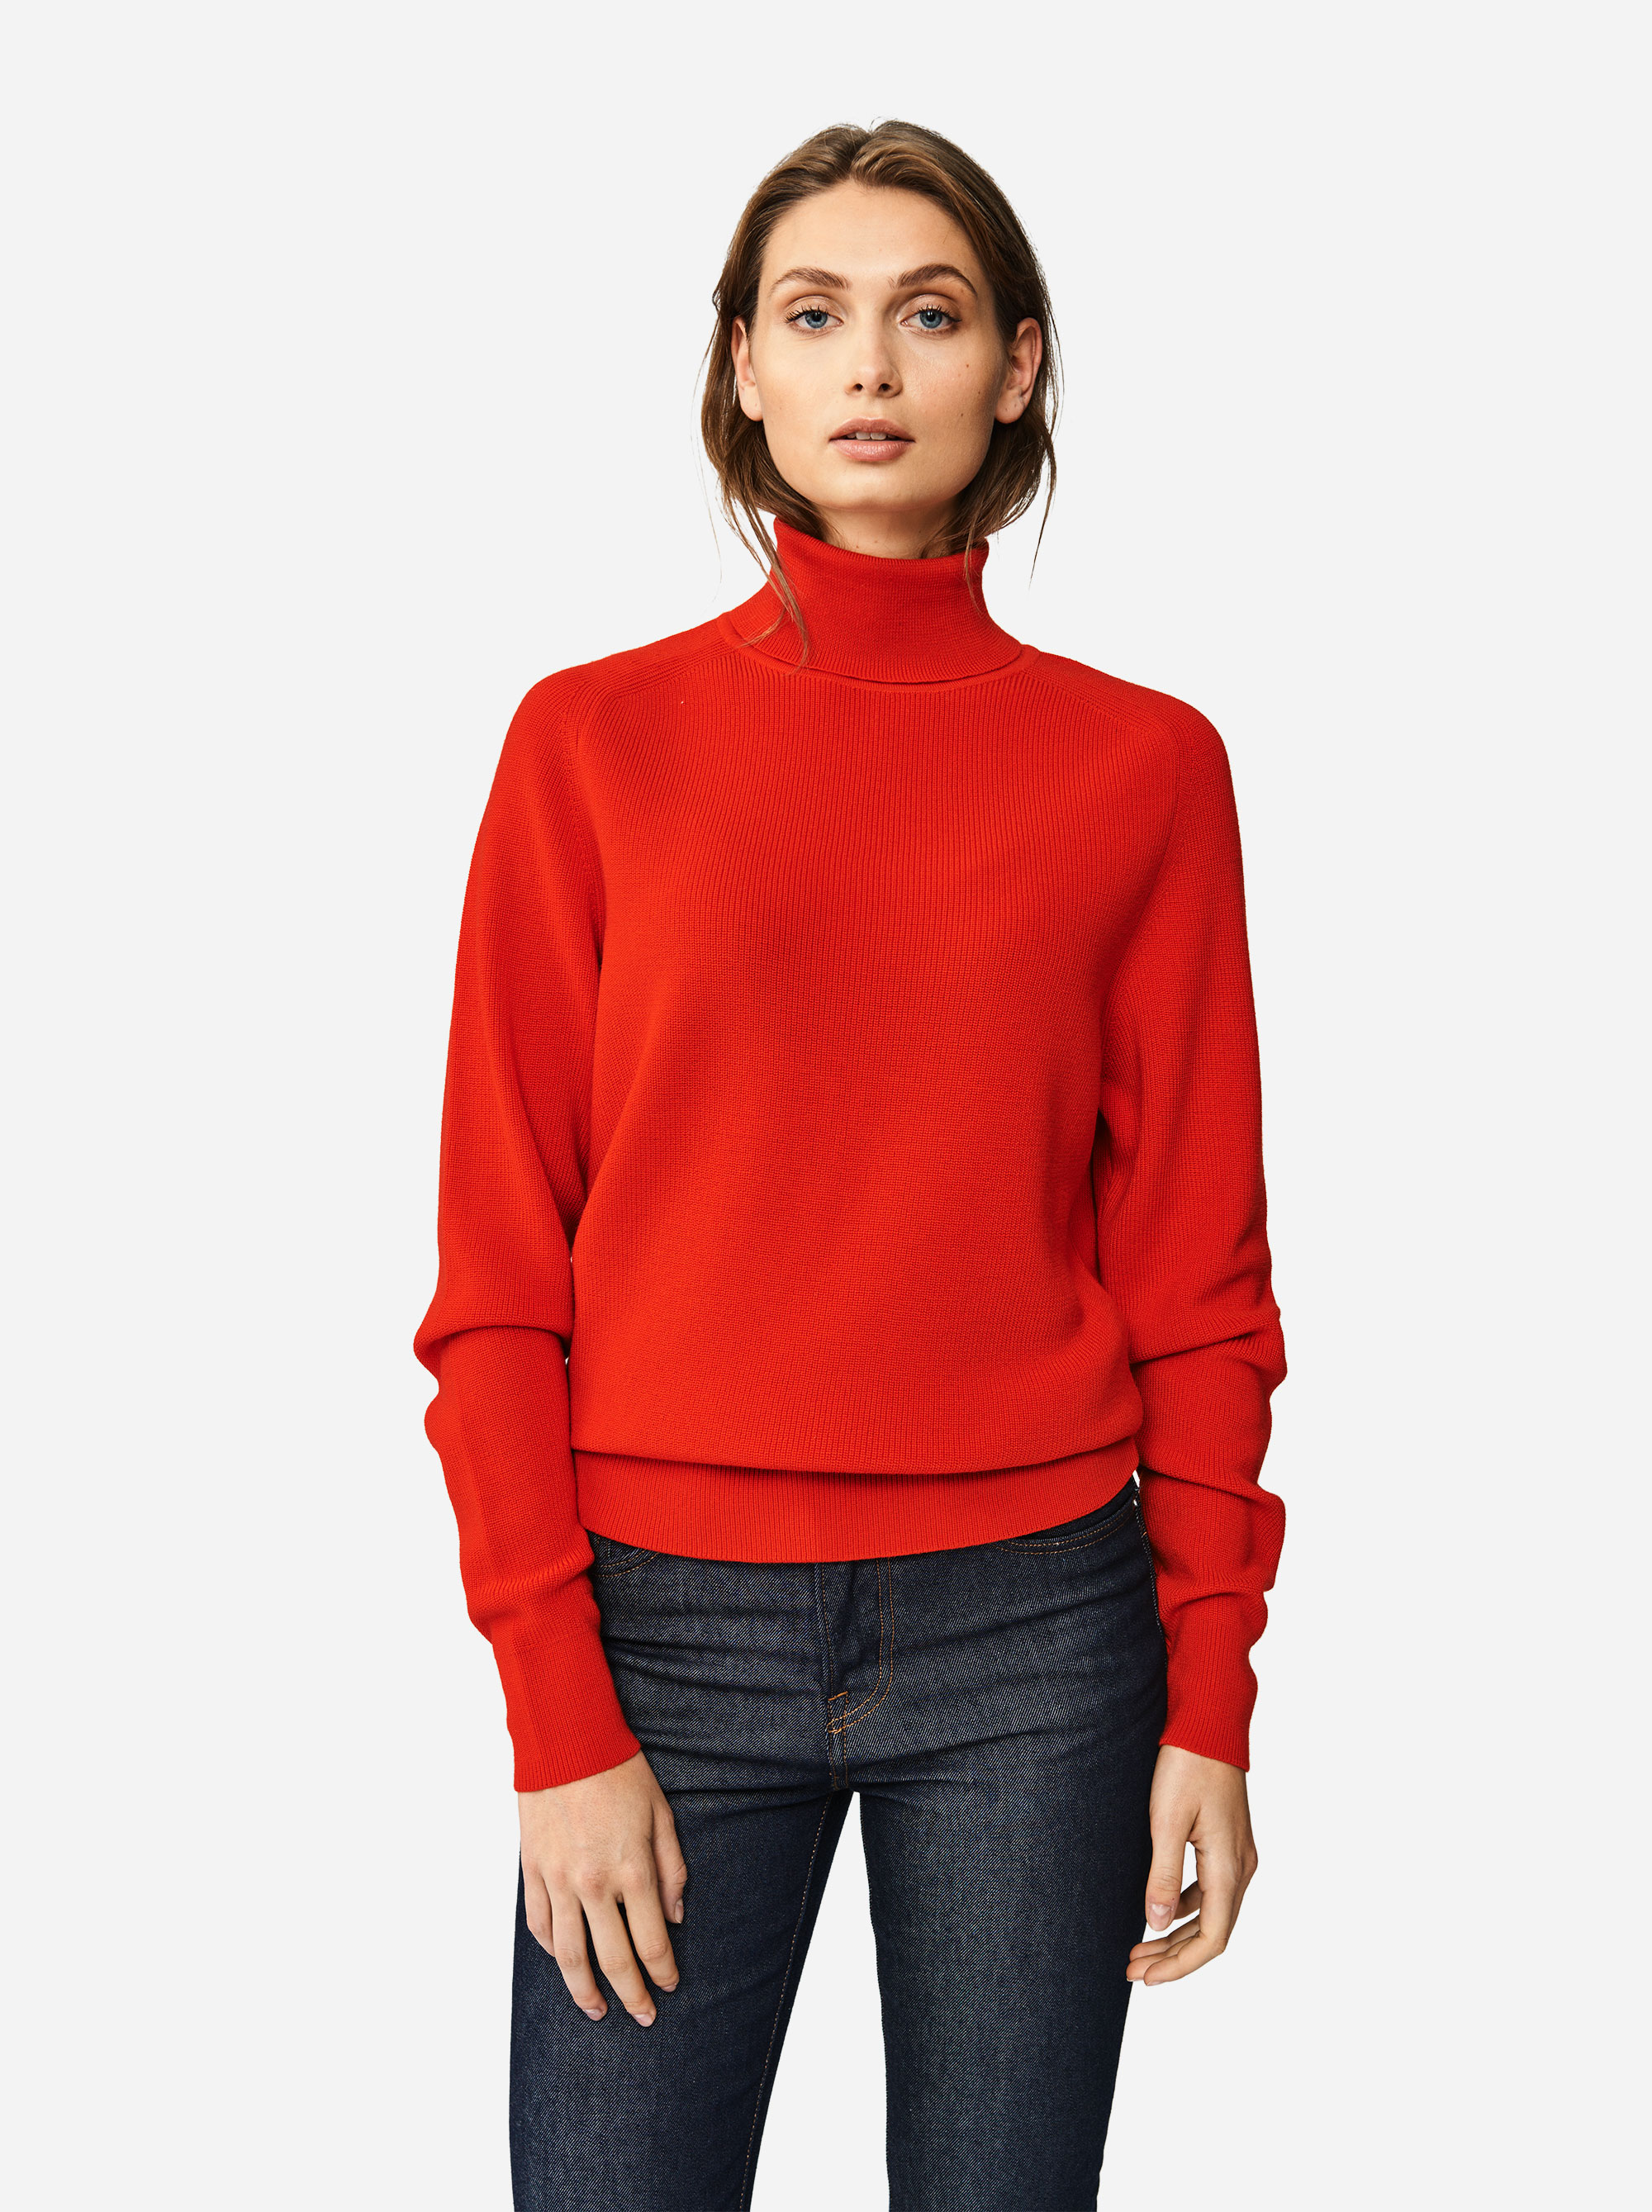 Teym - Turtleneck - The Merino Sweater - Men - Red - 3